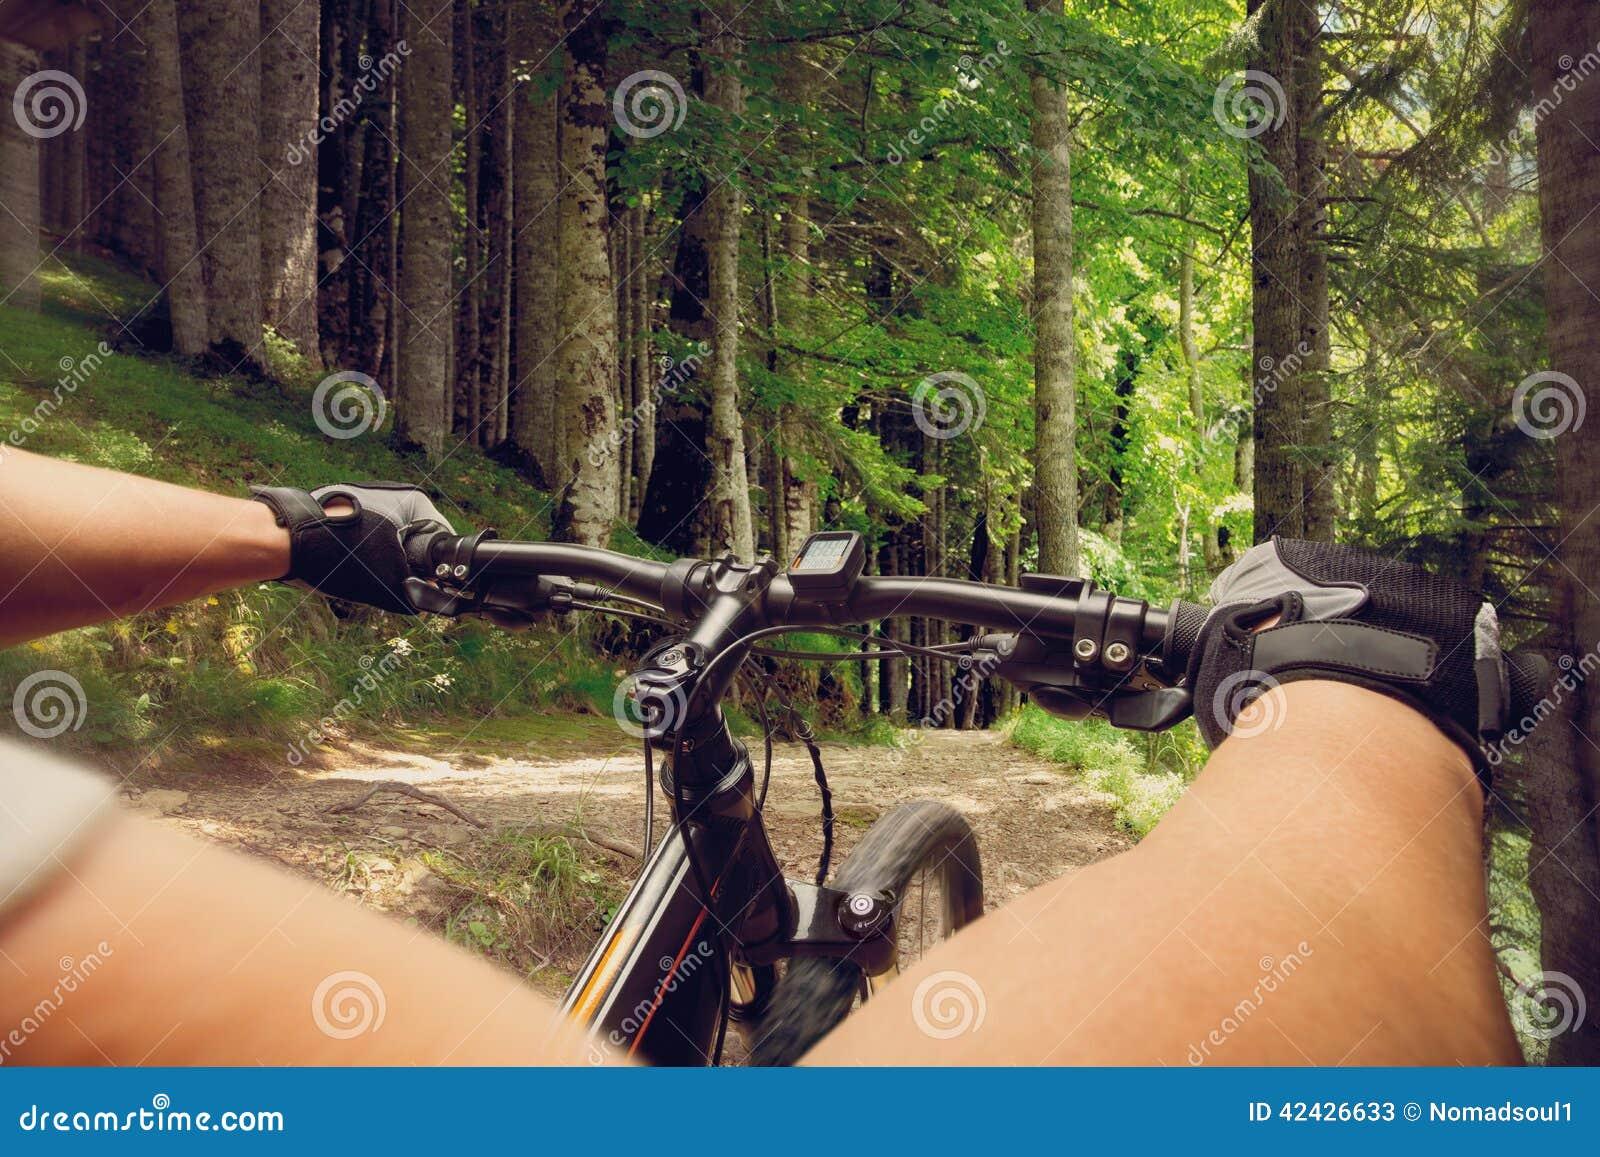 Ciclista en una bicicleta